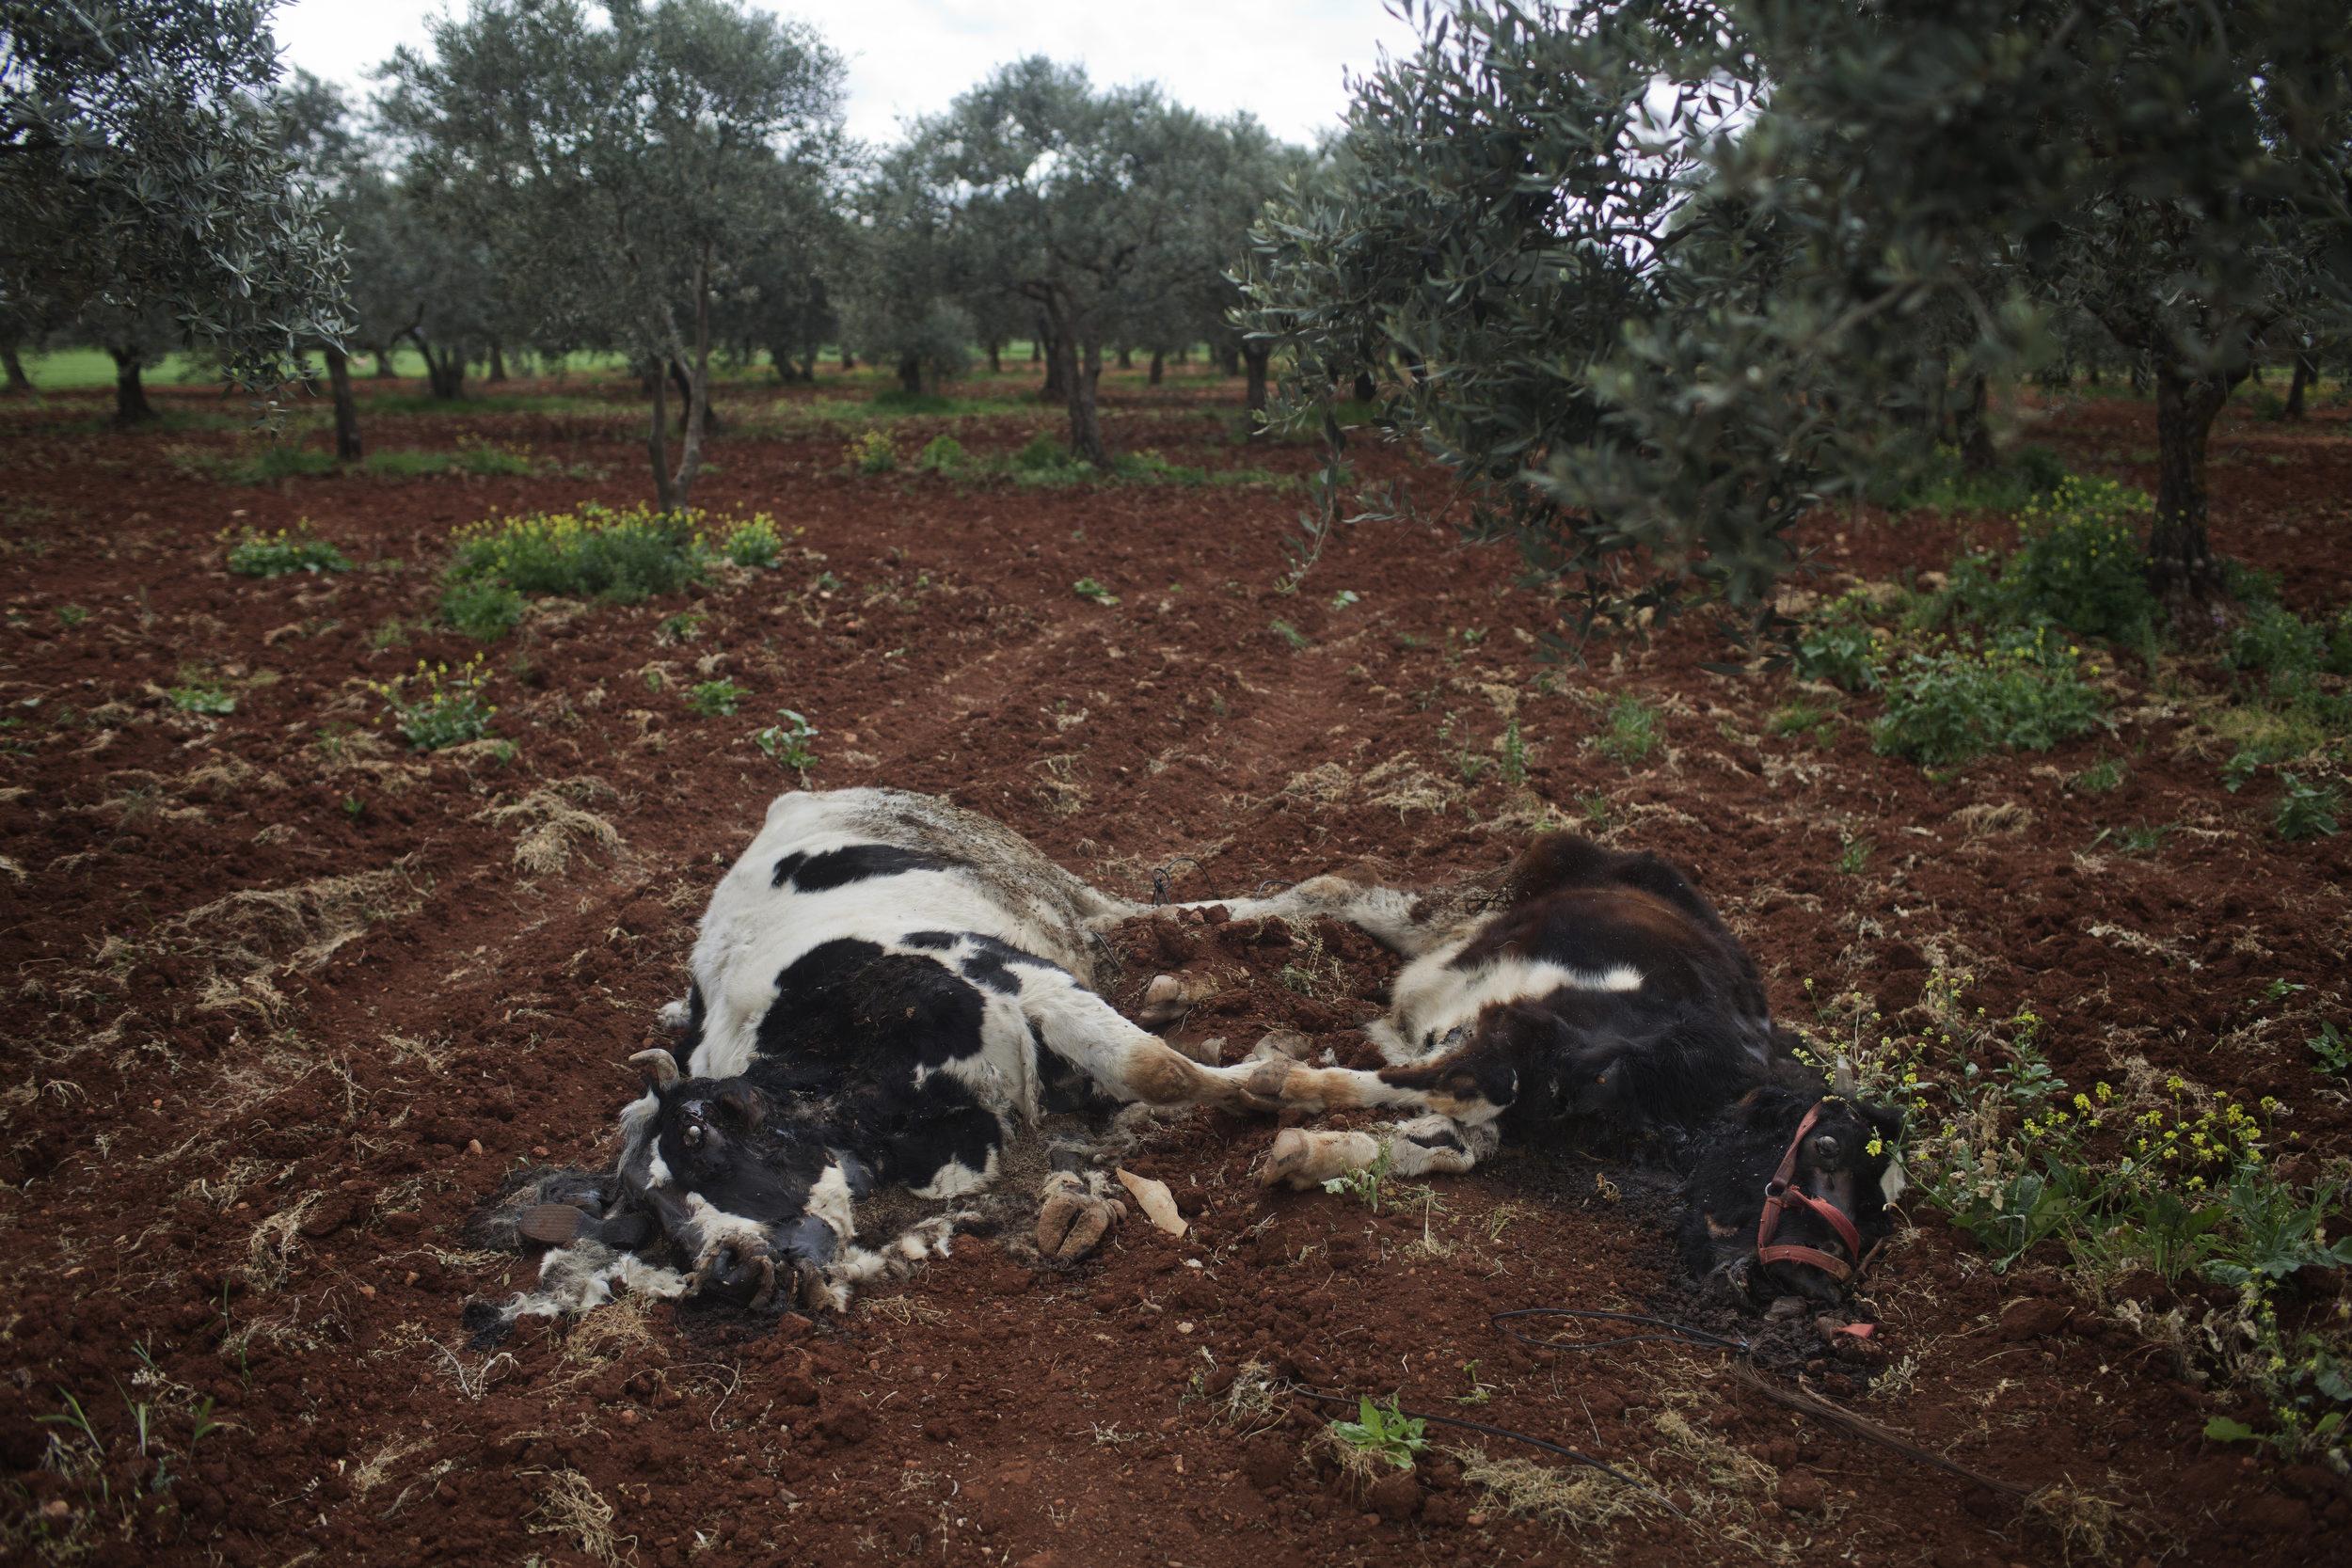 Livestock, shot down in the assault.